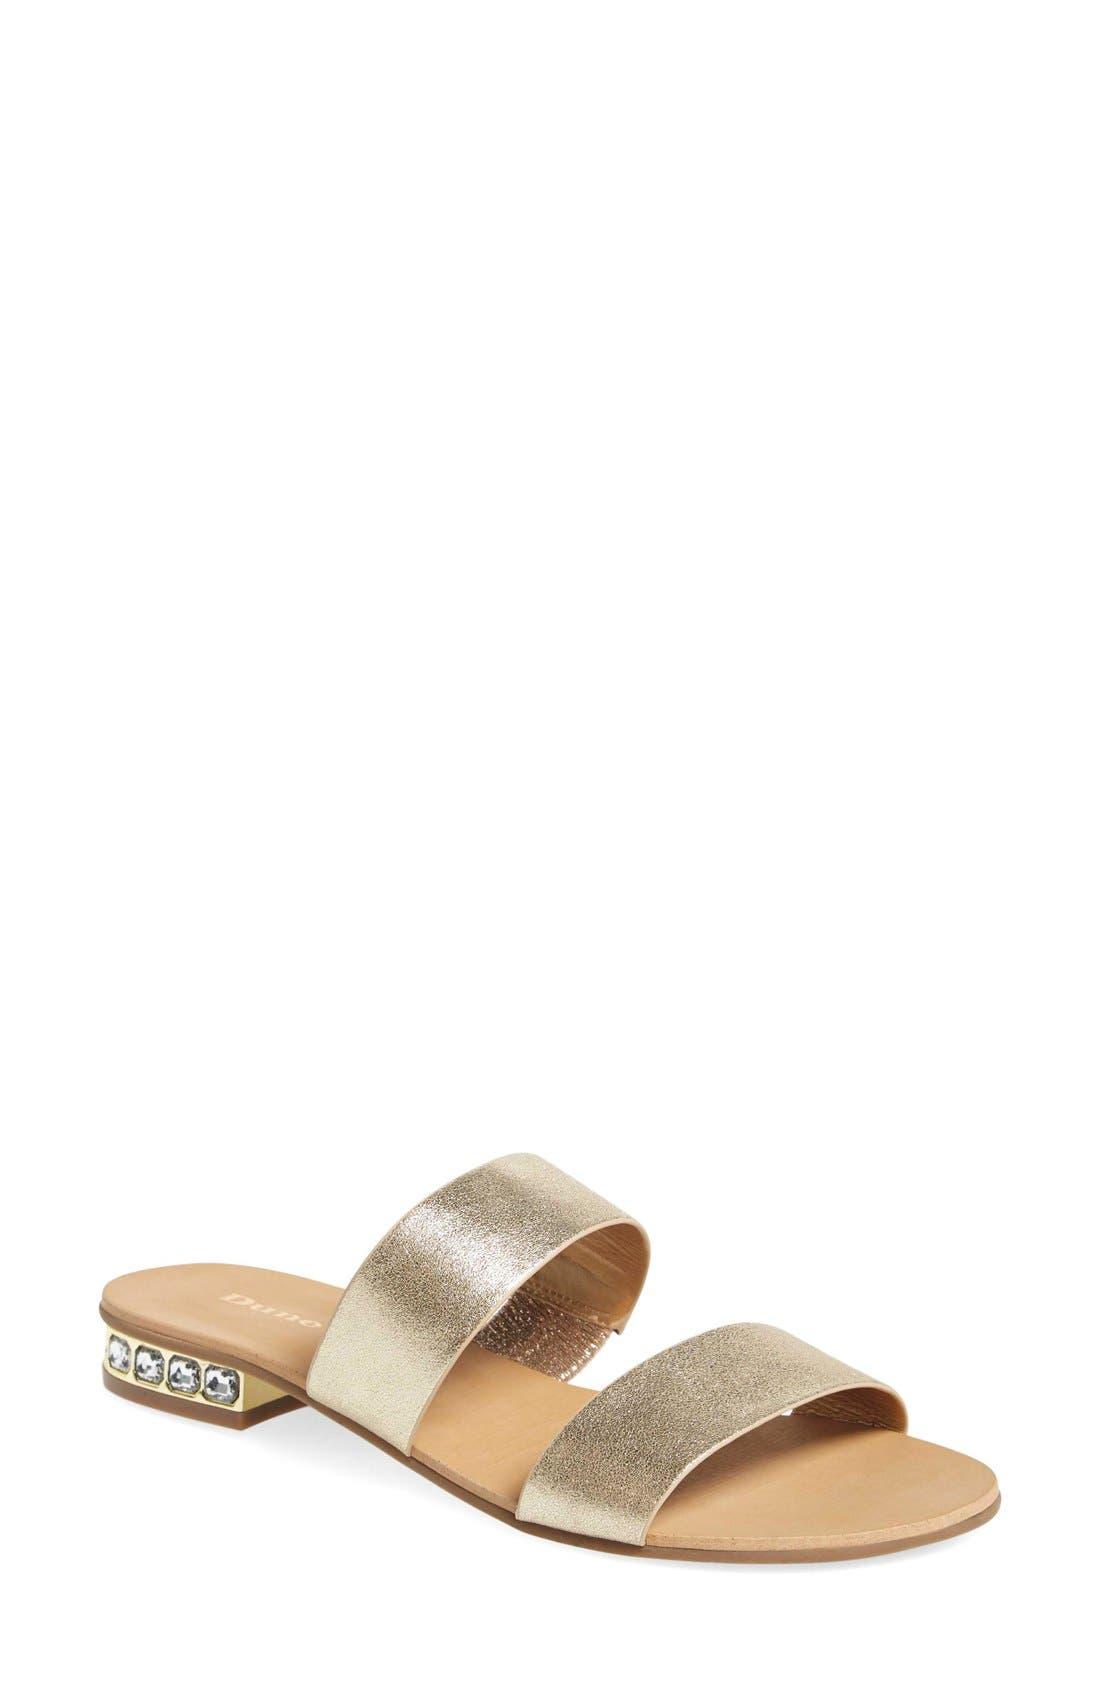 'Nesha' Flat Slide Sandal,                         Main,                         color, 713